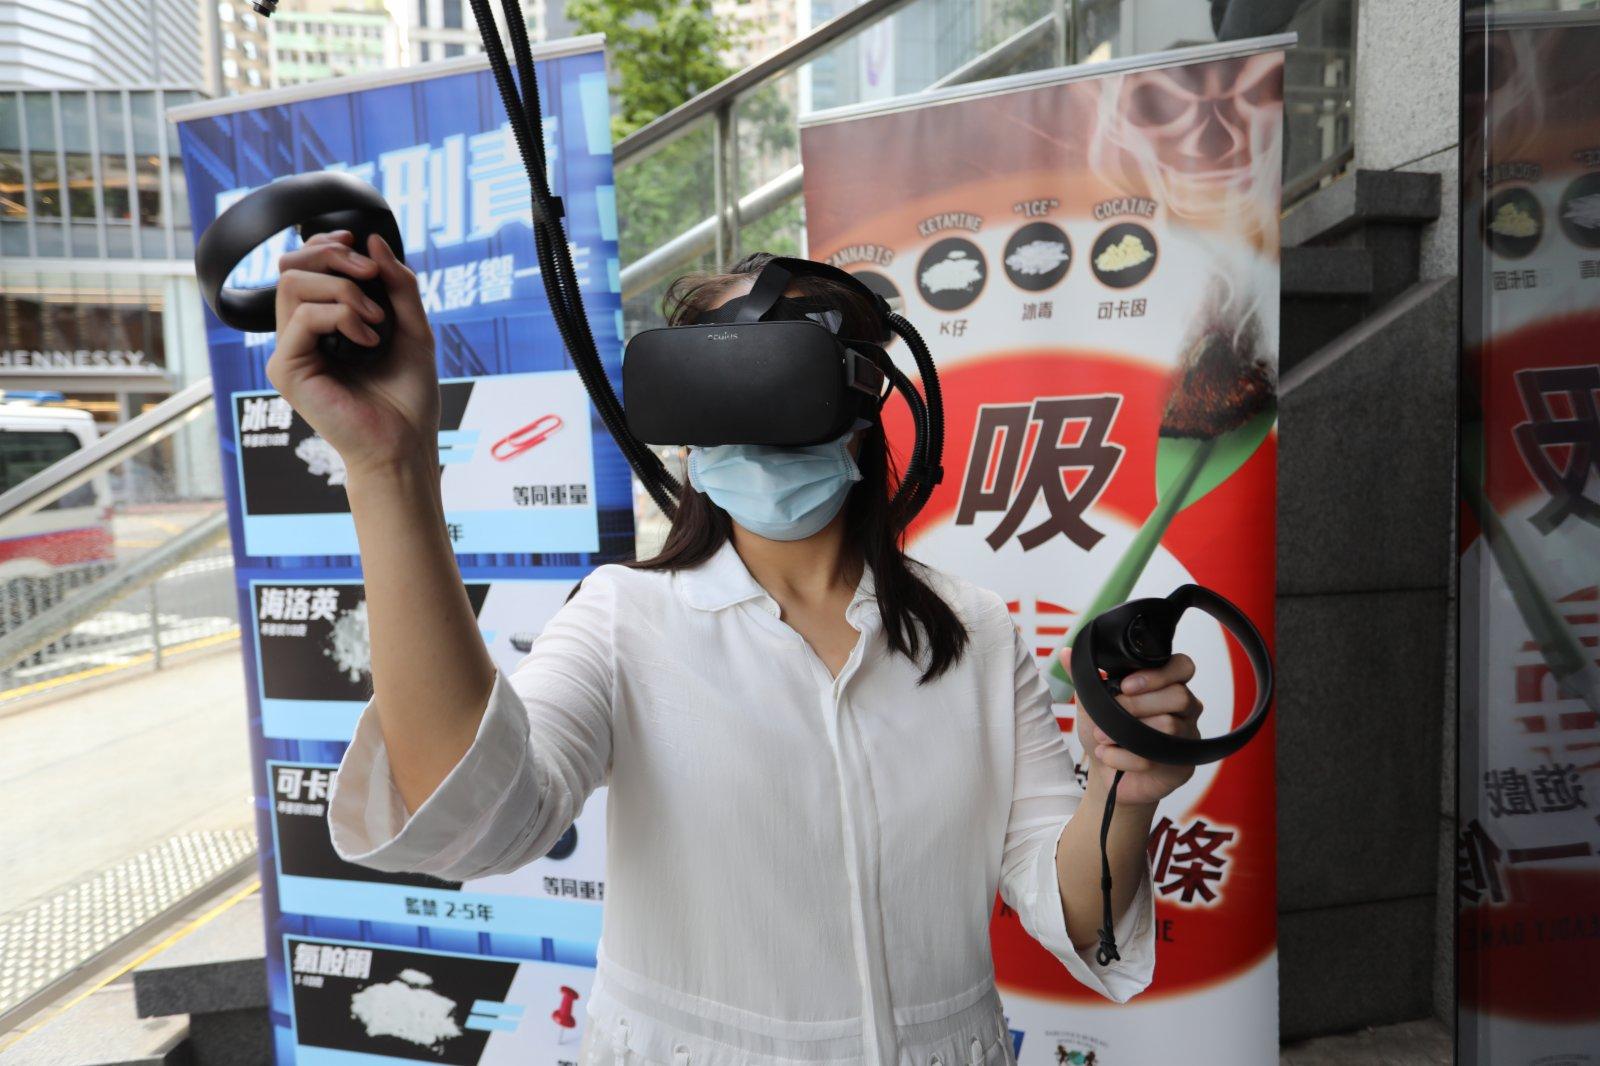 「VR新體驗」讓市民感受吸毒後不良反應。(大公文匯全媒體記者李斯哲攝)